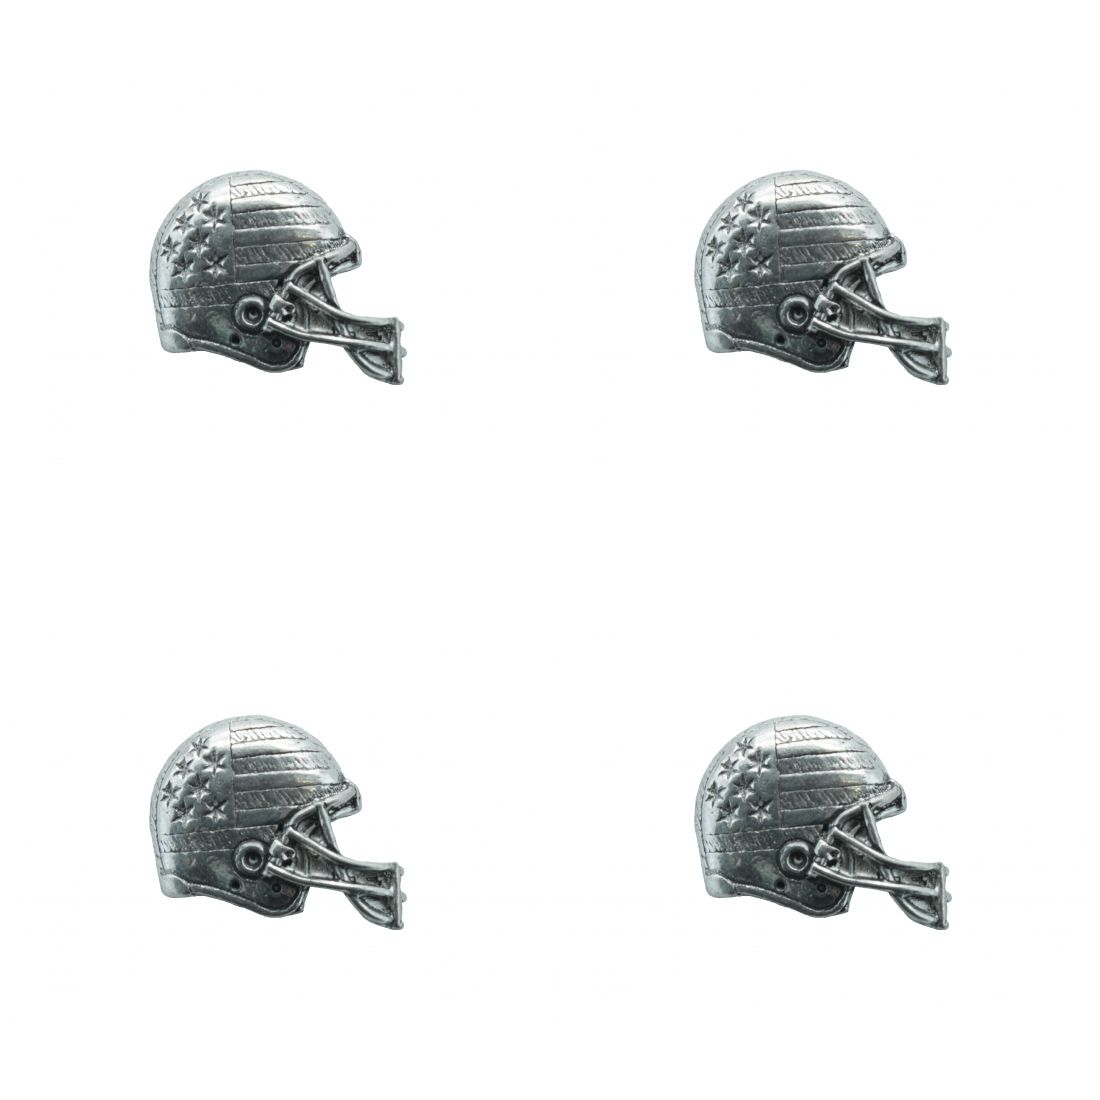 4 x Pin Anstecker Badge Football Helm, 2,7x3,1cm